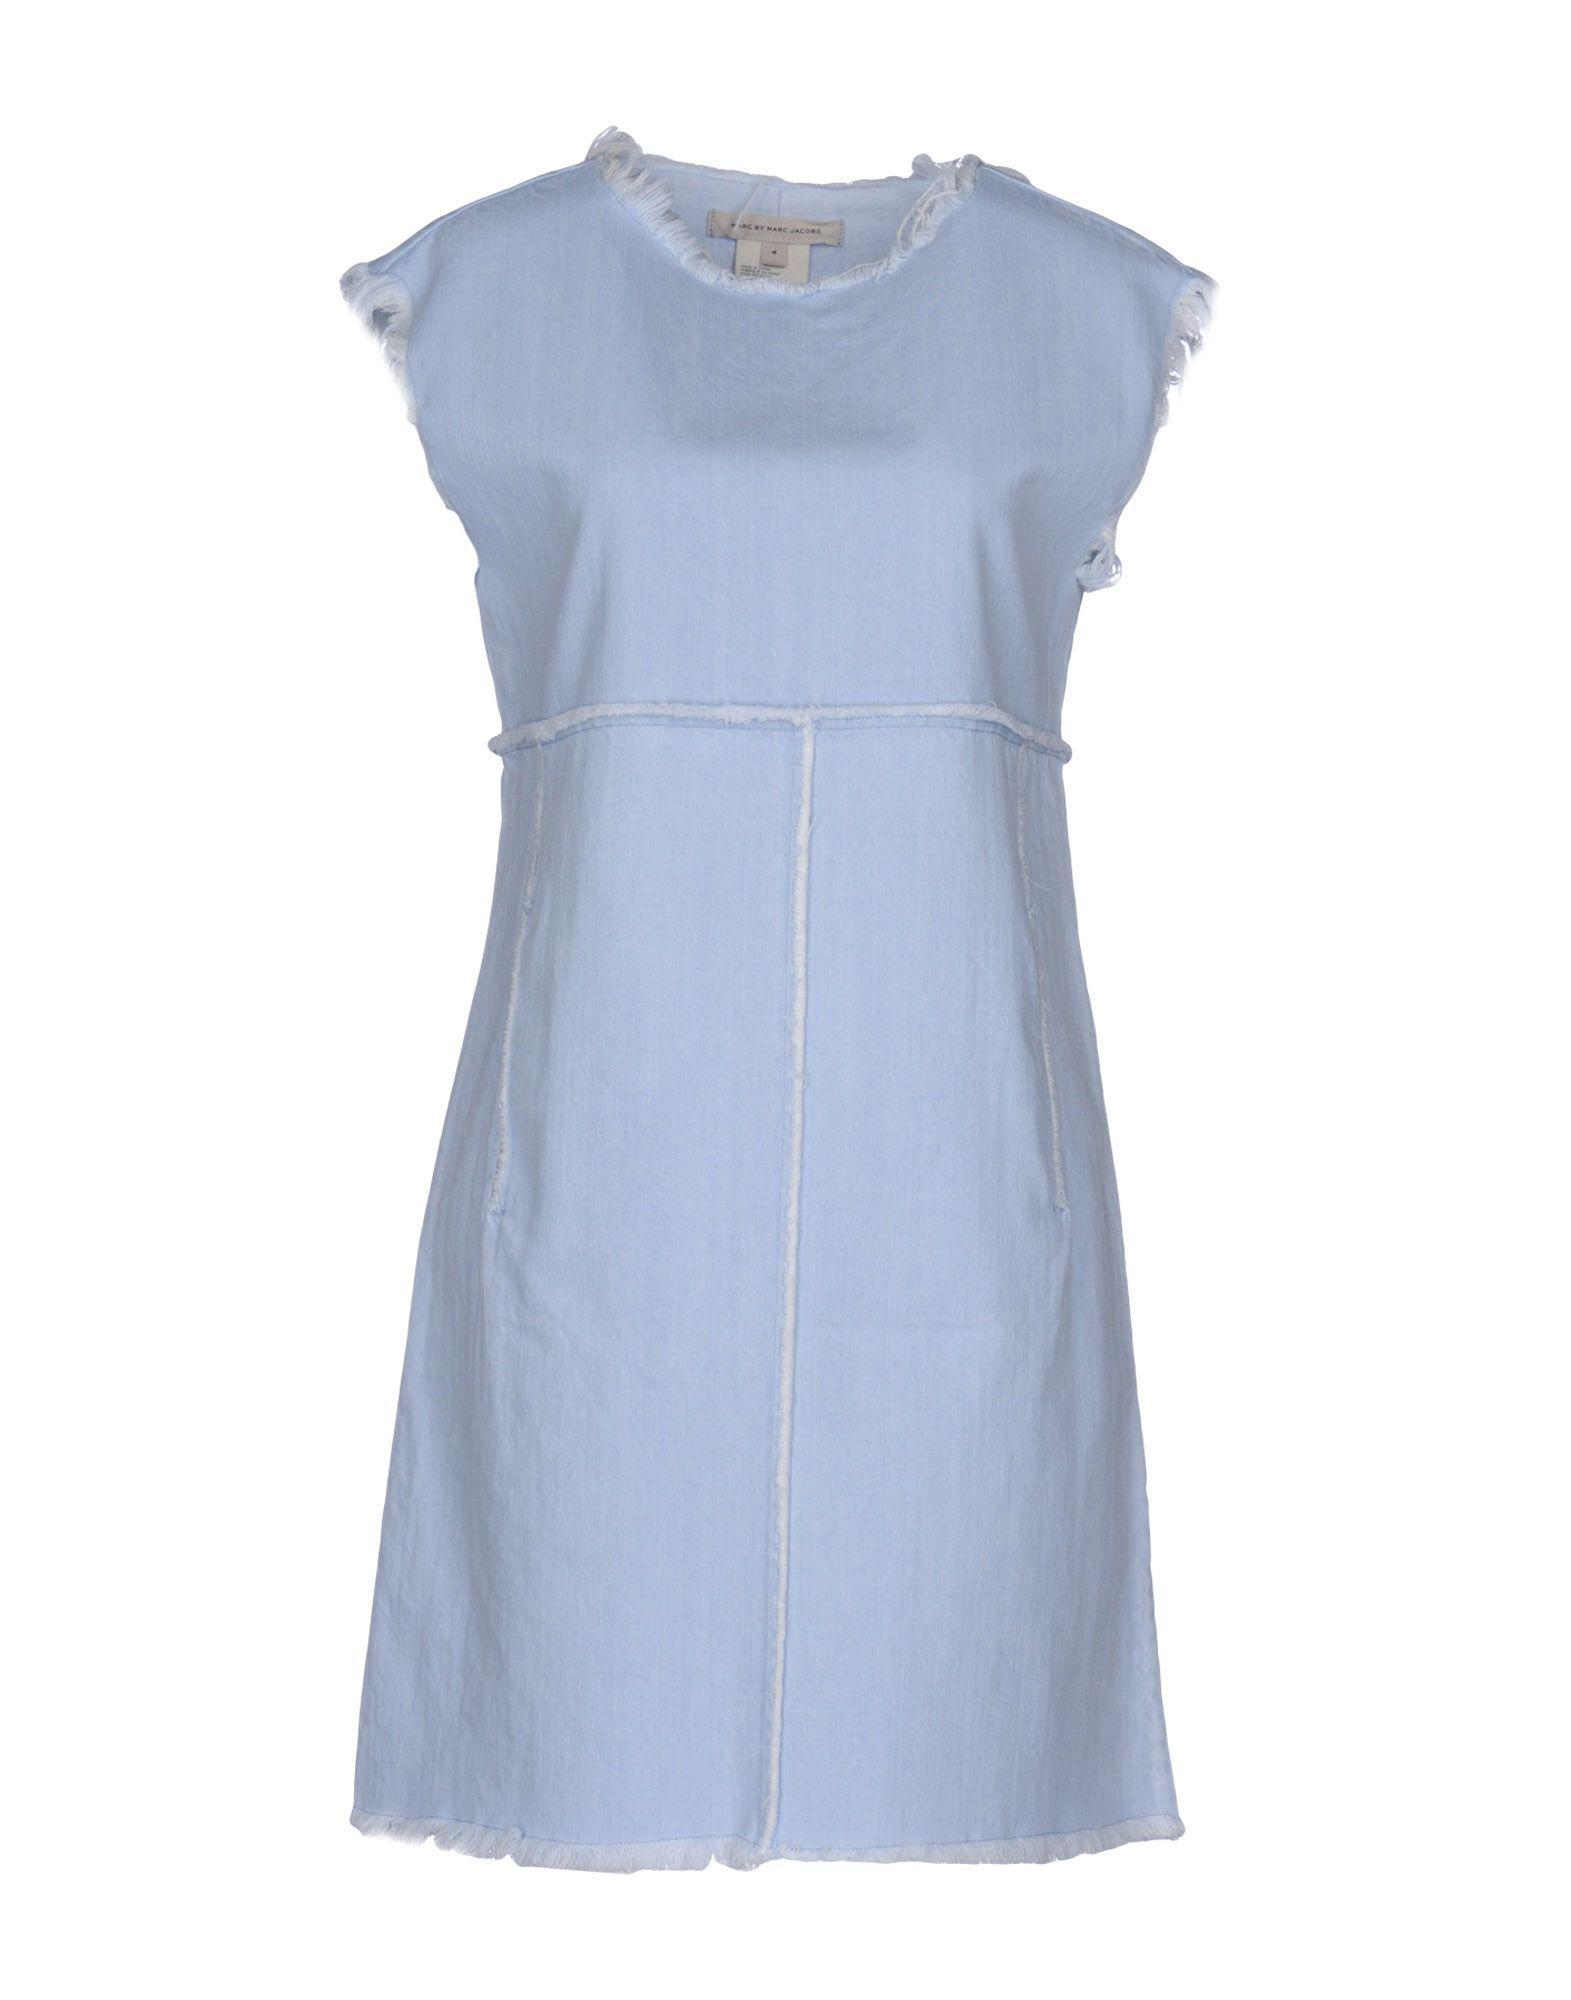 Marc By Marc Jacobs Blue Denim Dress